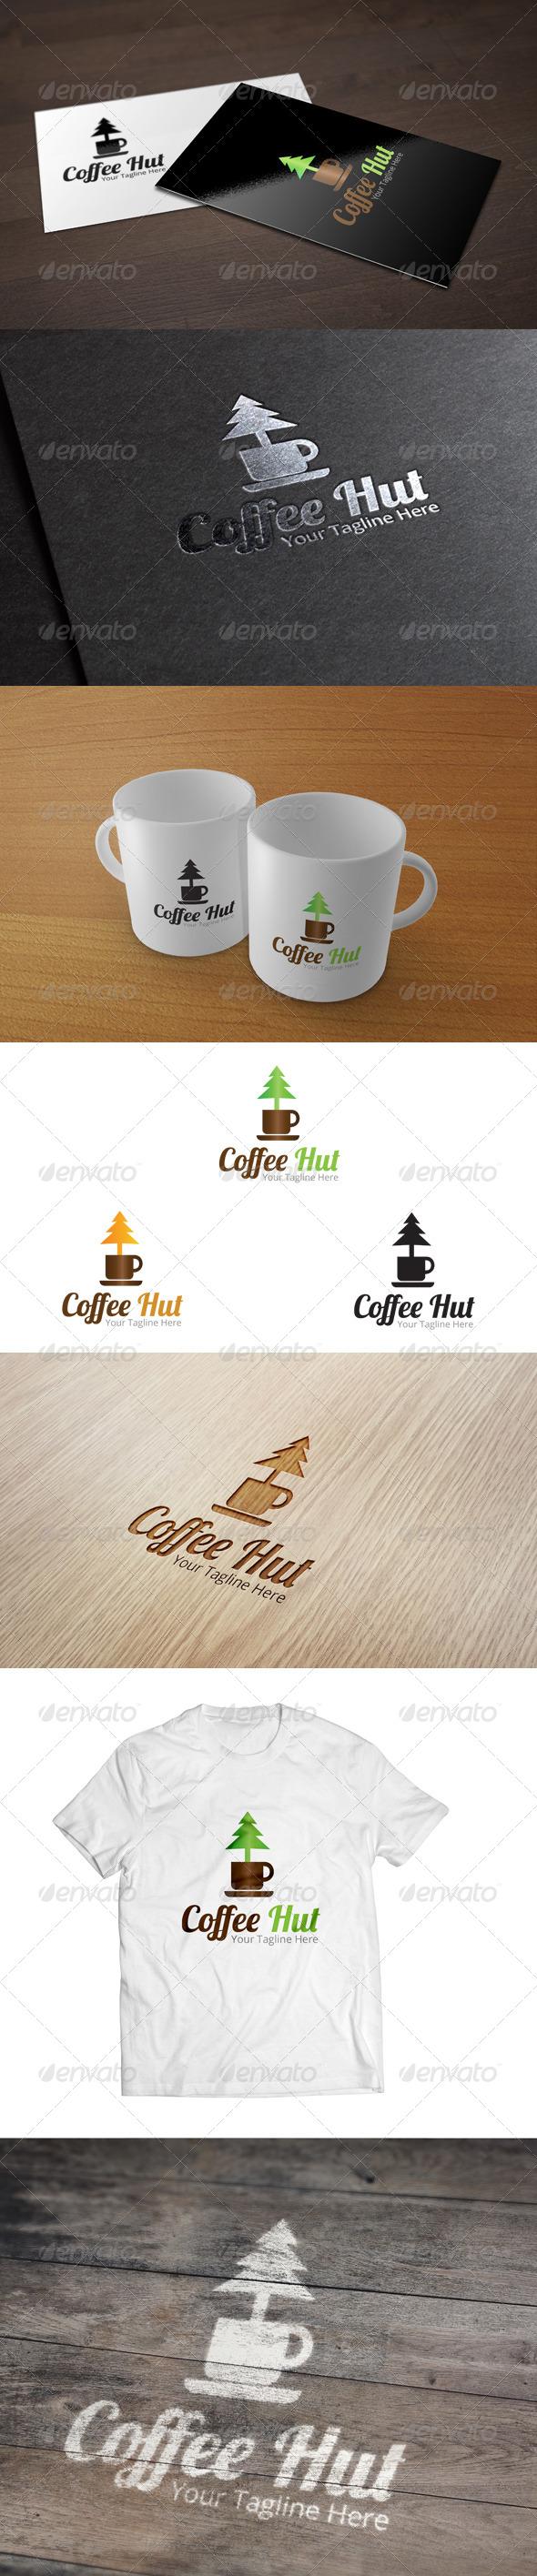 Coffee Hut - Logo Template  - Food Logo Templates